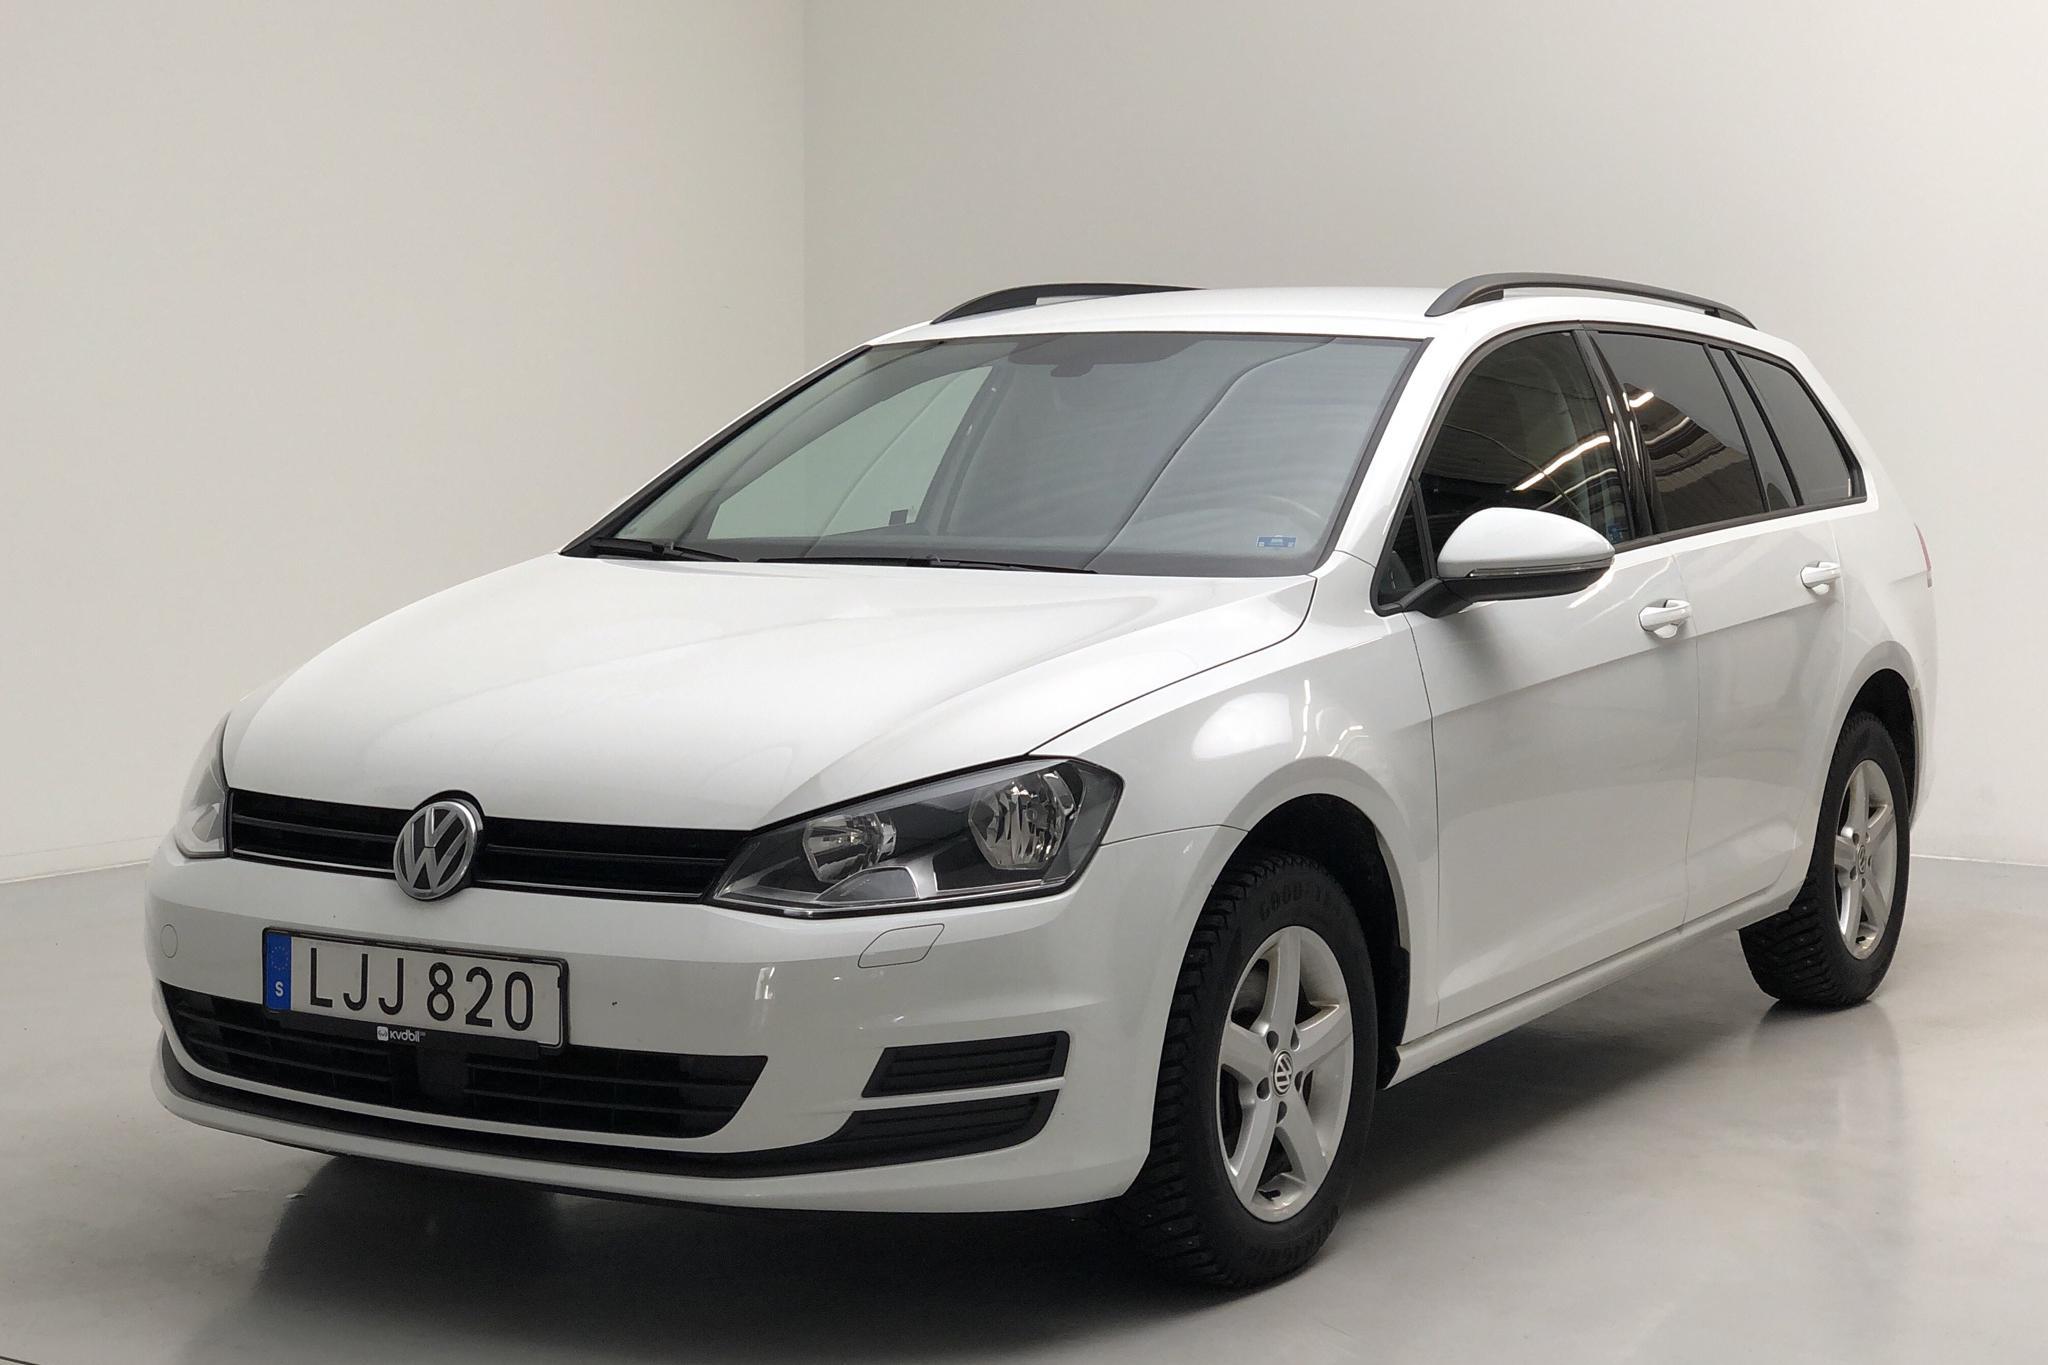 VW Golf VII 1.6 TDI BlueMotion Sportscombi (110hk) - 84 570 km - Manual - white - 2017